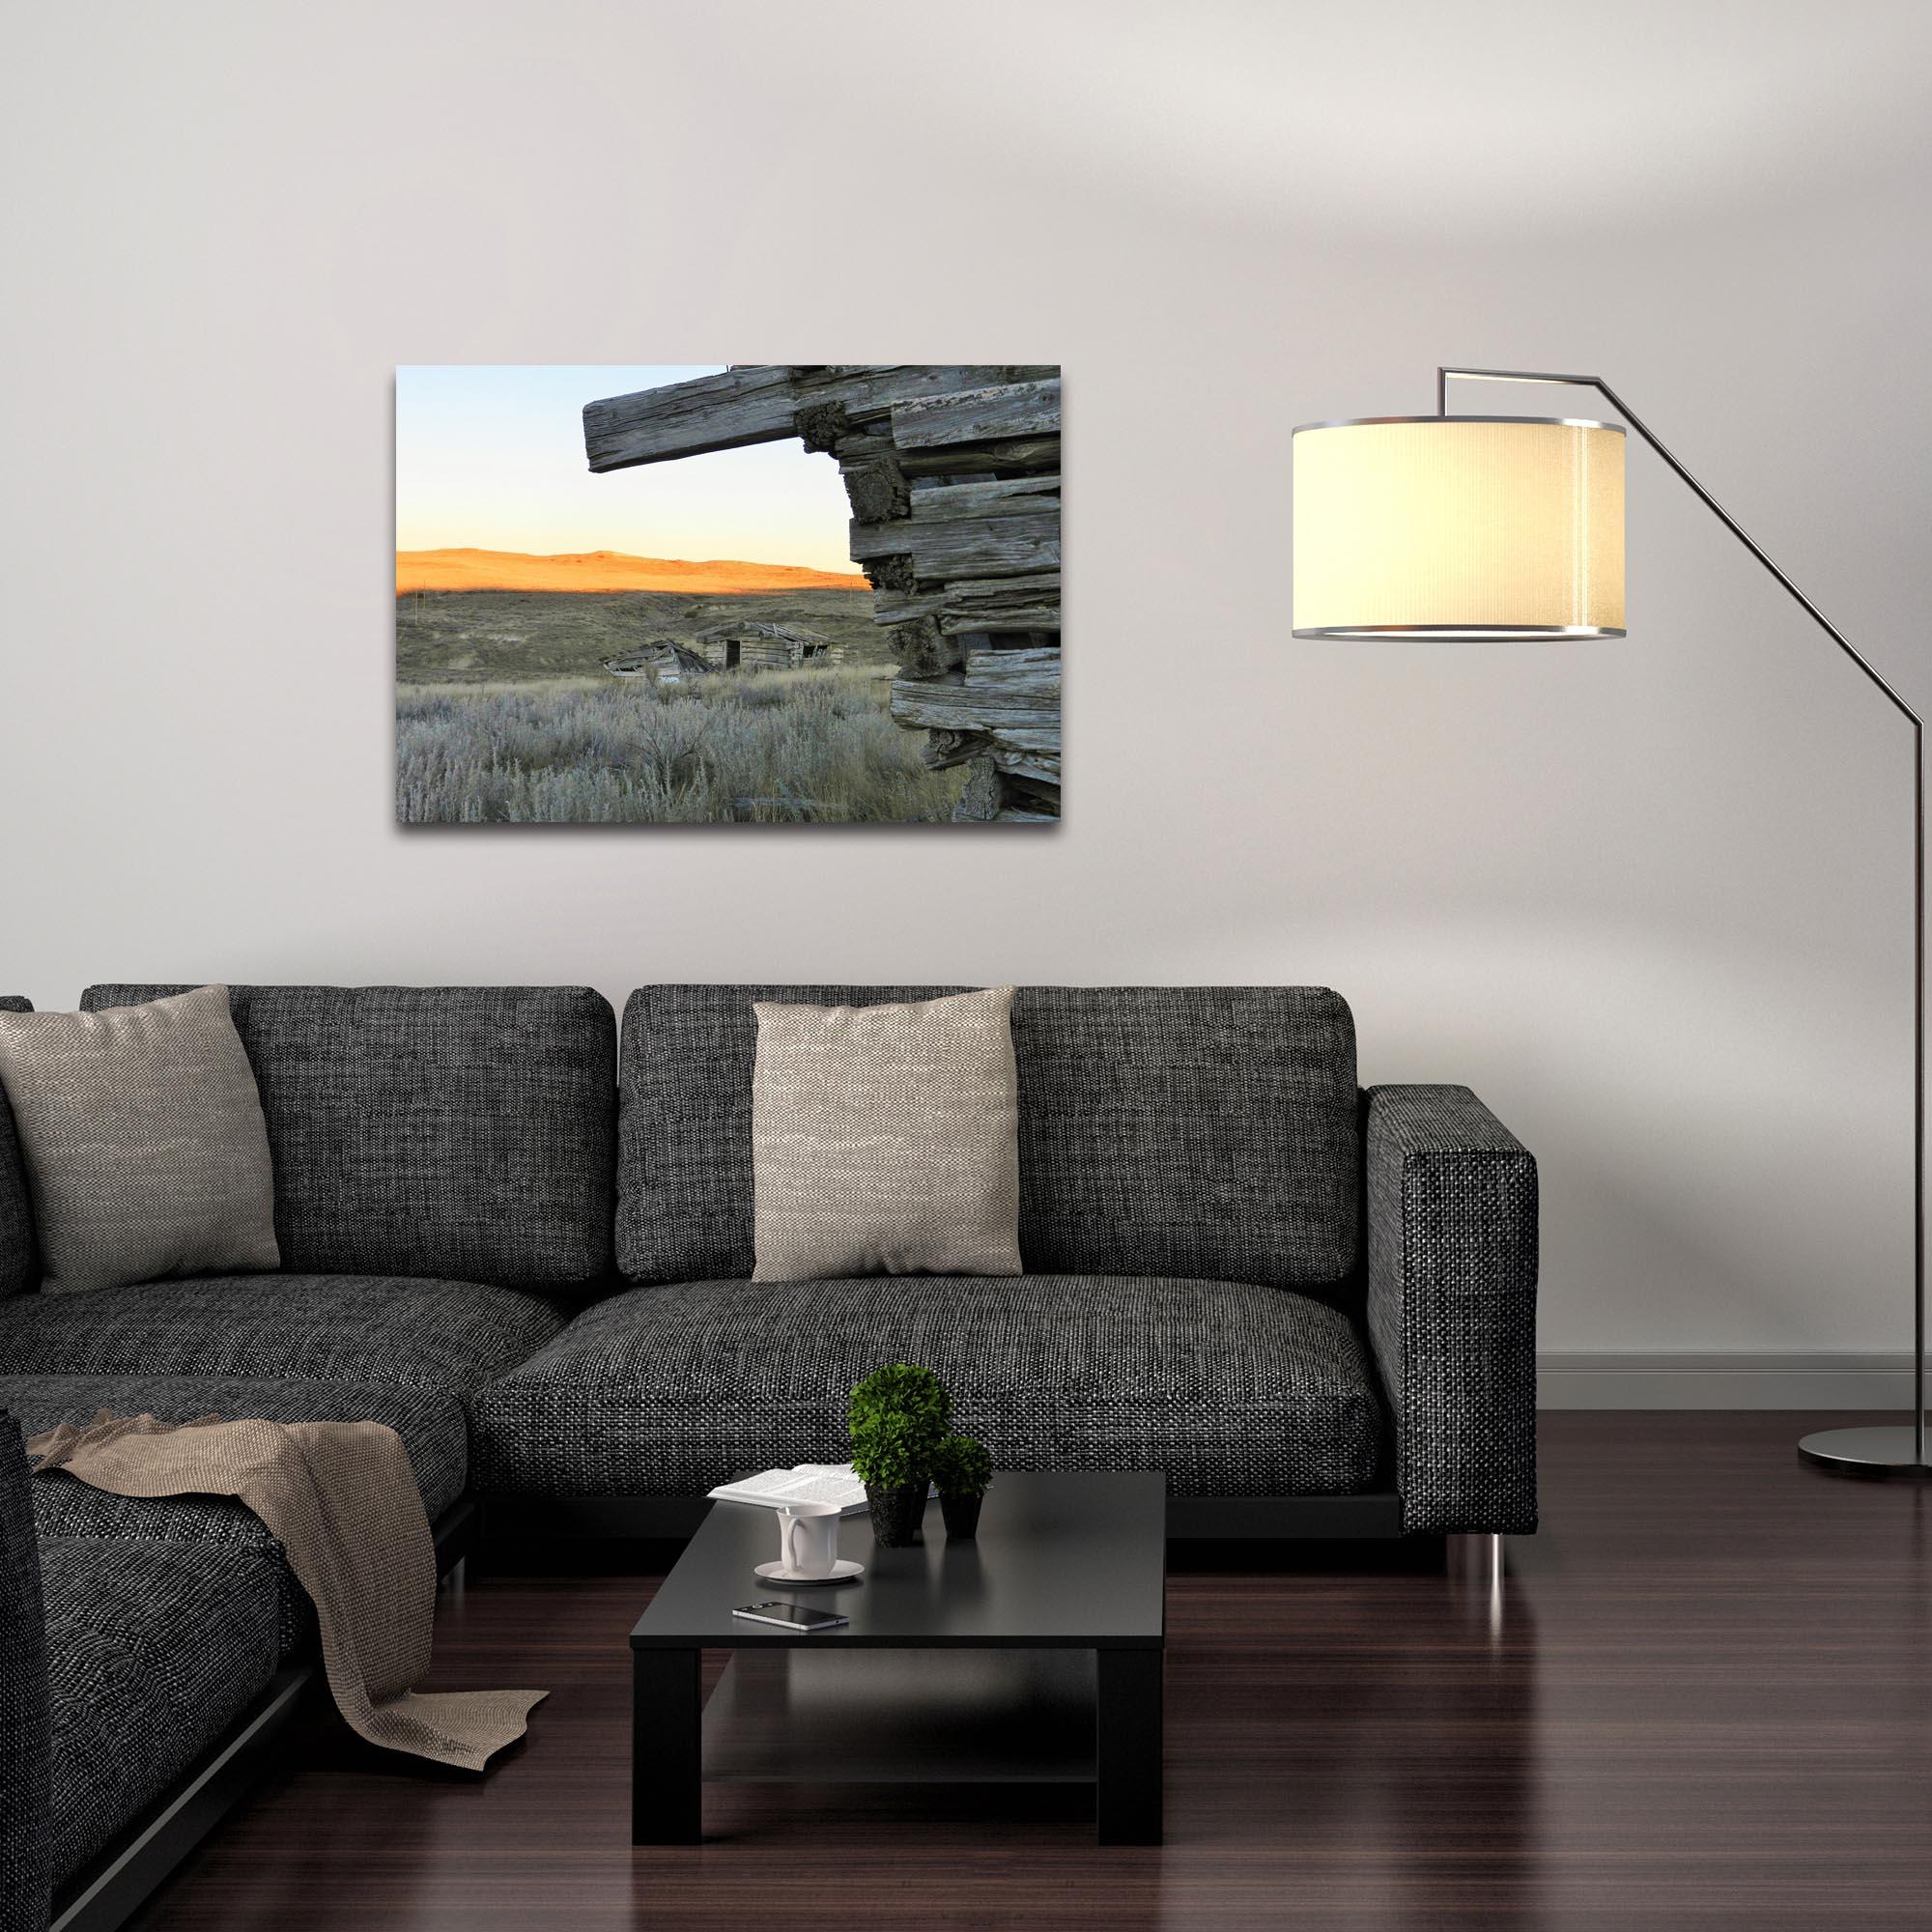 Western Wall Art 'The Corner' - American West Decor on Metal or Plexiglass - Lifestyle View